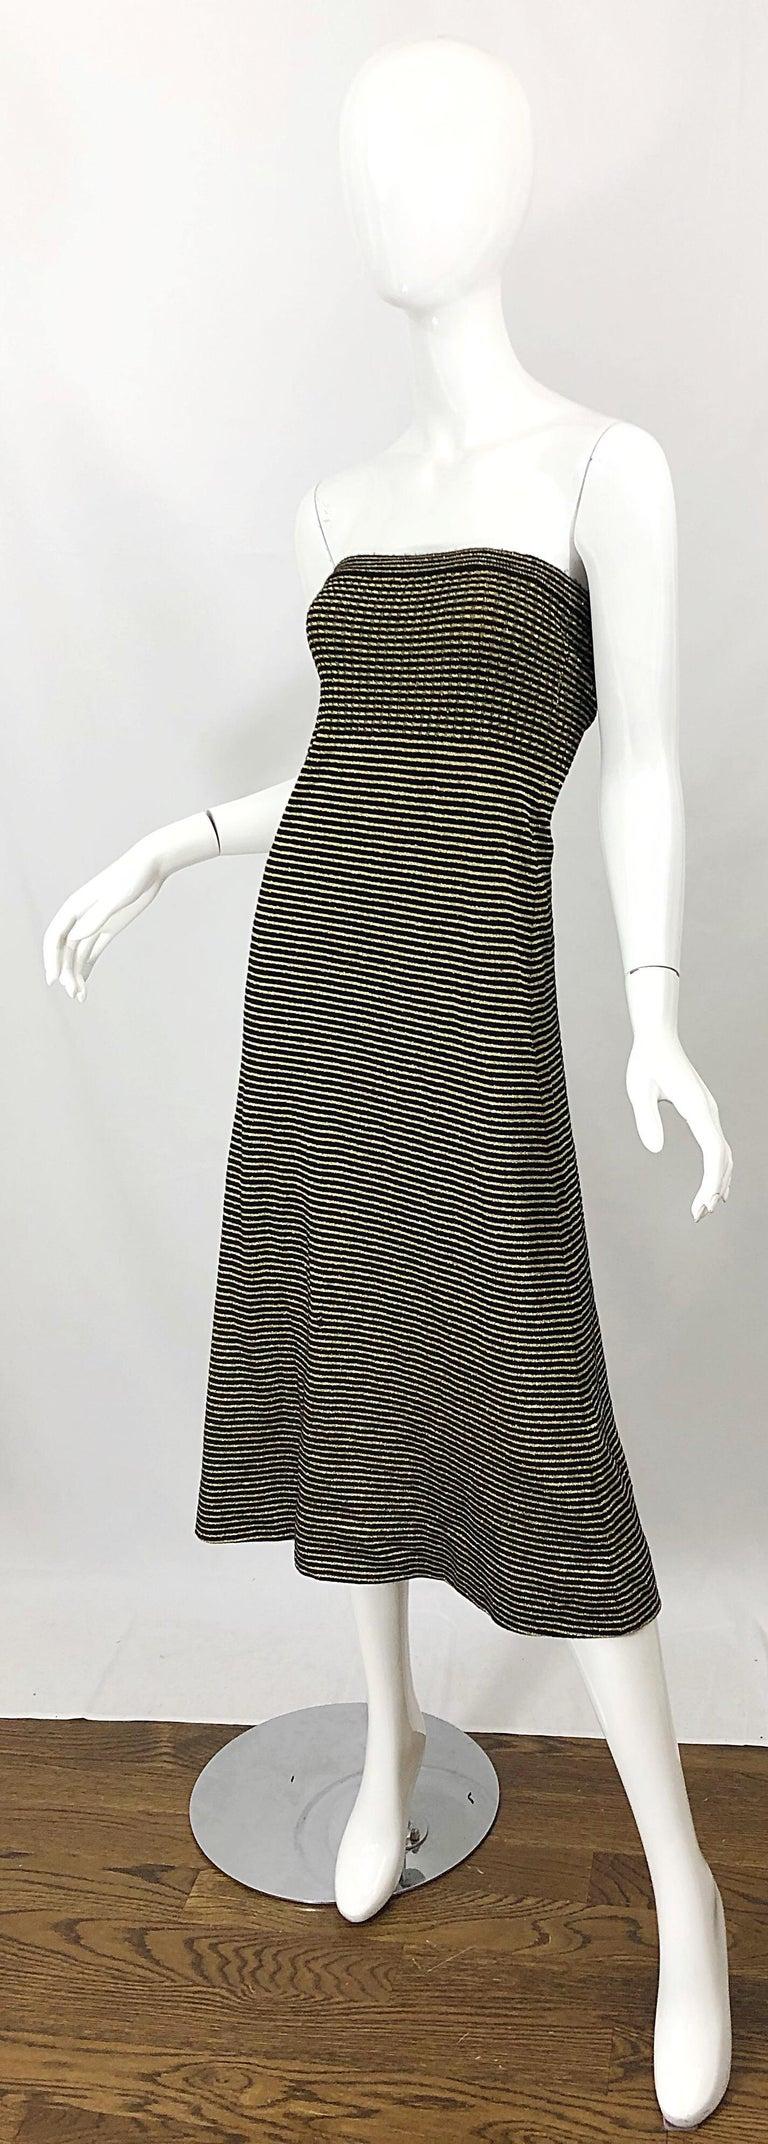 Vintage Yves Saint Laurent YSL 70s Gold Black Strapless Knit Dress or Maxi Skirt For Sale 4